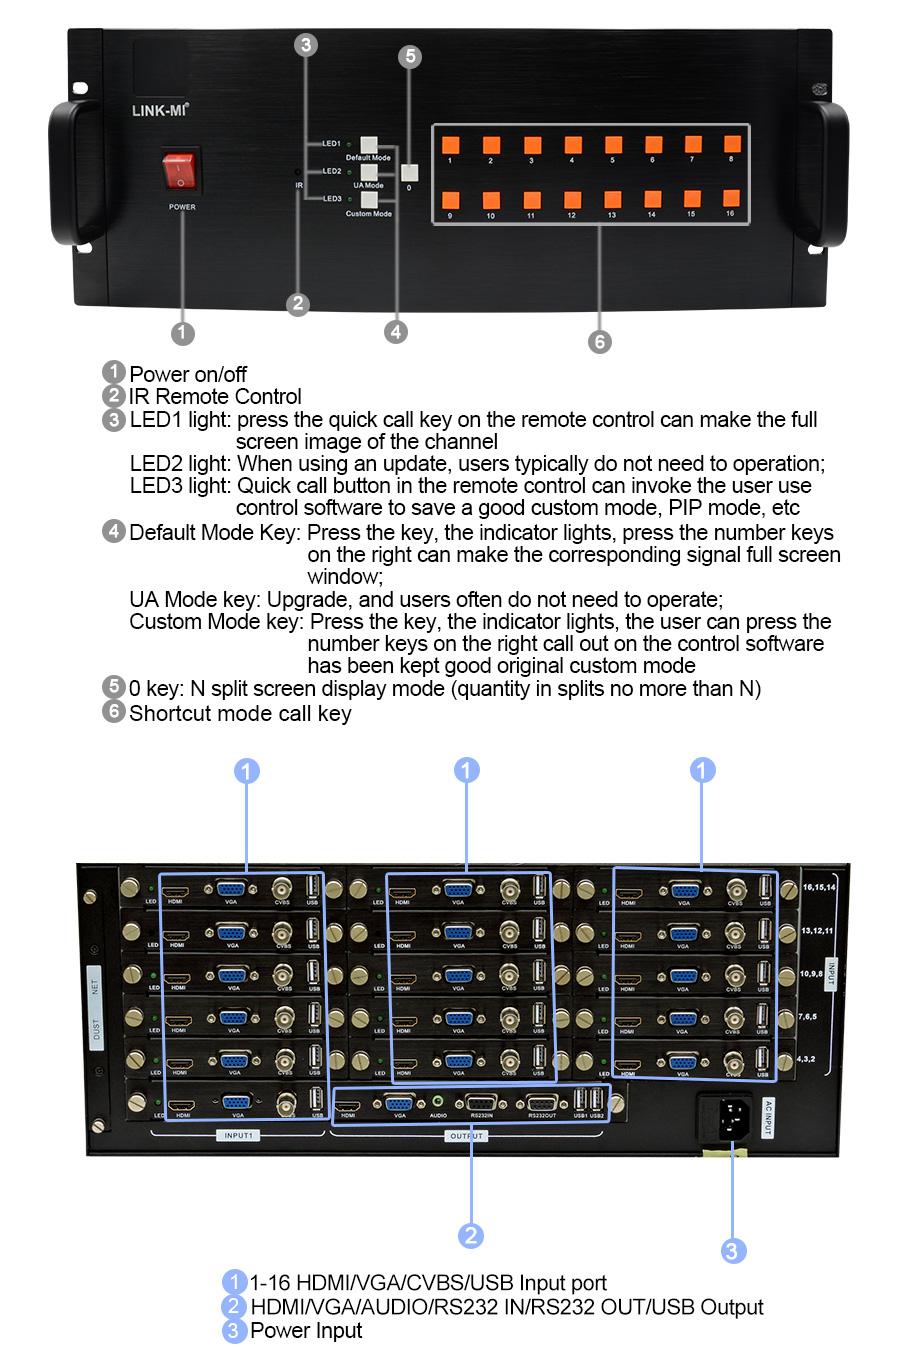 Link Mi Lm Sh161 Quad Screen Multiviewer Hdmi Vga Usb Cvbs Multi To Wire Diagram Wiring